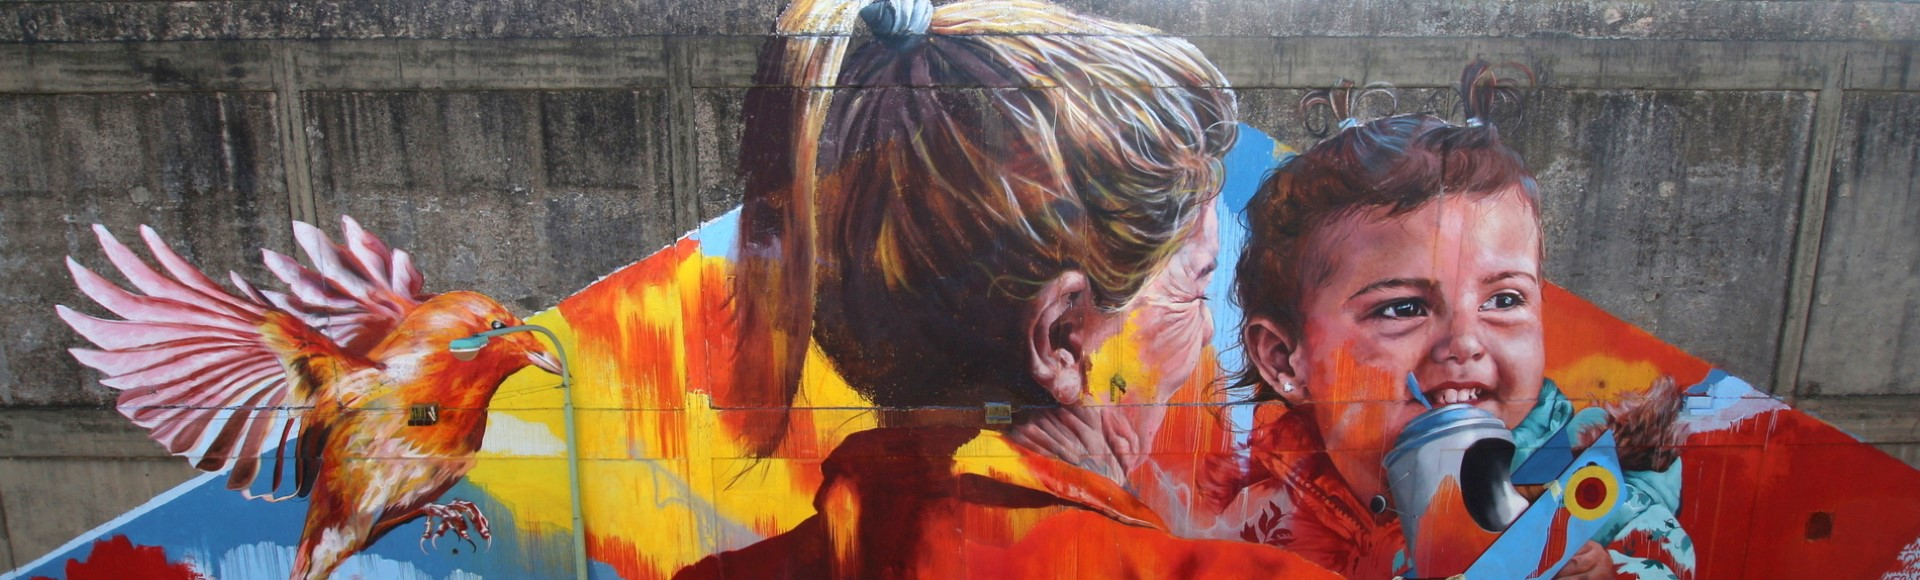 murales buenos aires proyecto organizado por BA Street Art buenosairesstreetart.com